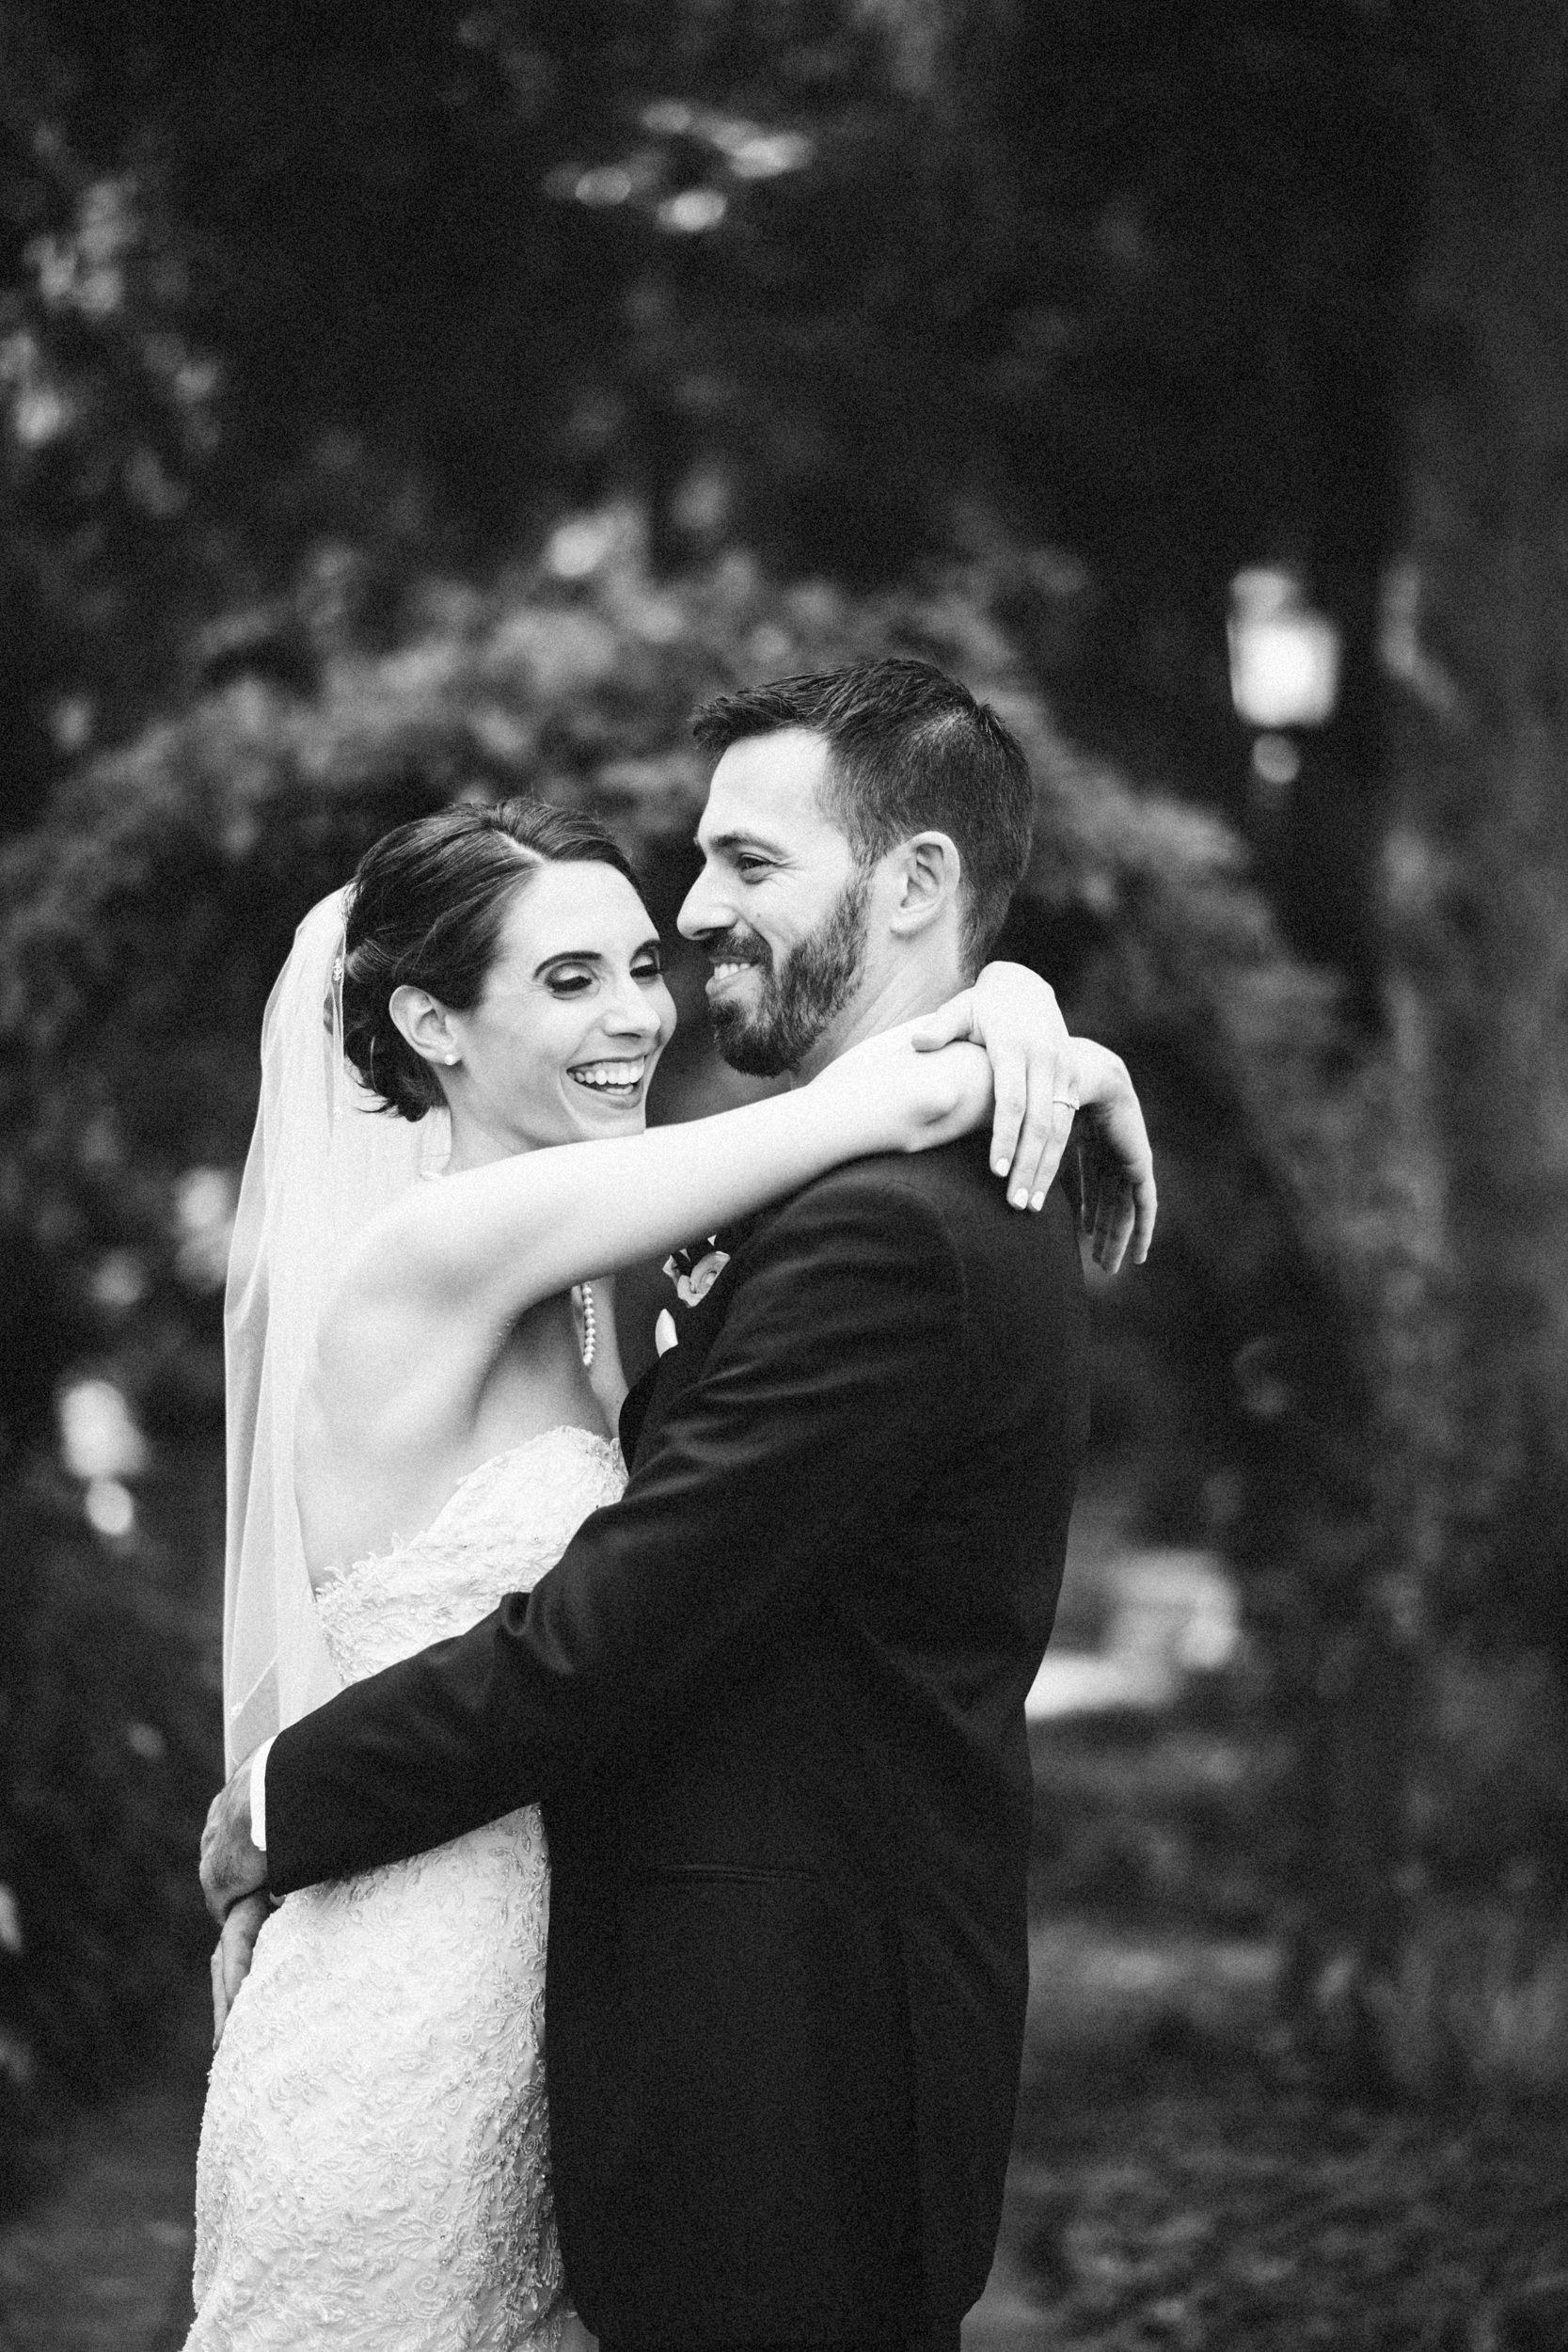 Louisville-Kentucky-Wedding-Elopement-Photographer-Sarah-Katherine-Davis-Photography-Whitehall-Classic-Timeless-Garden-Wedding-484.jpg